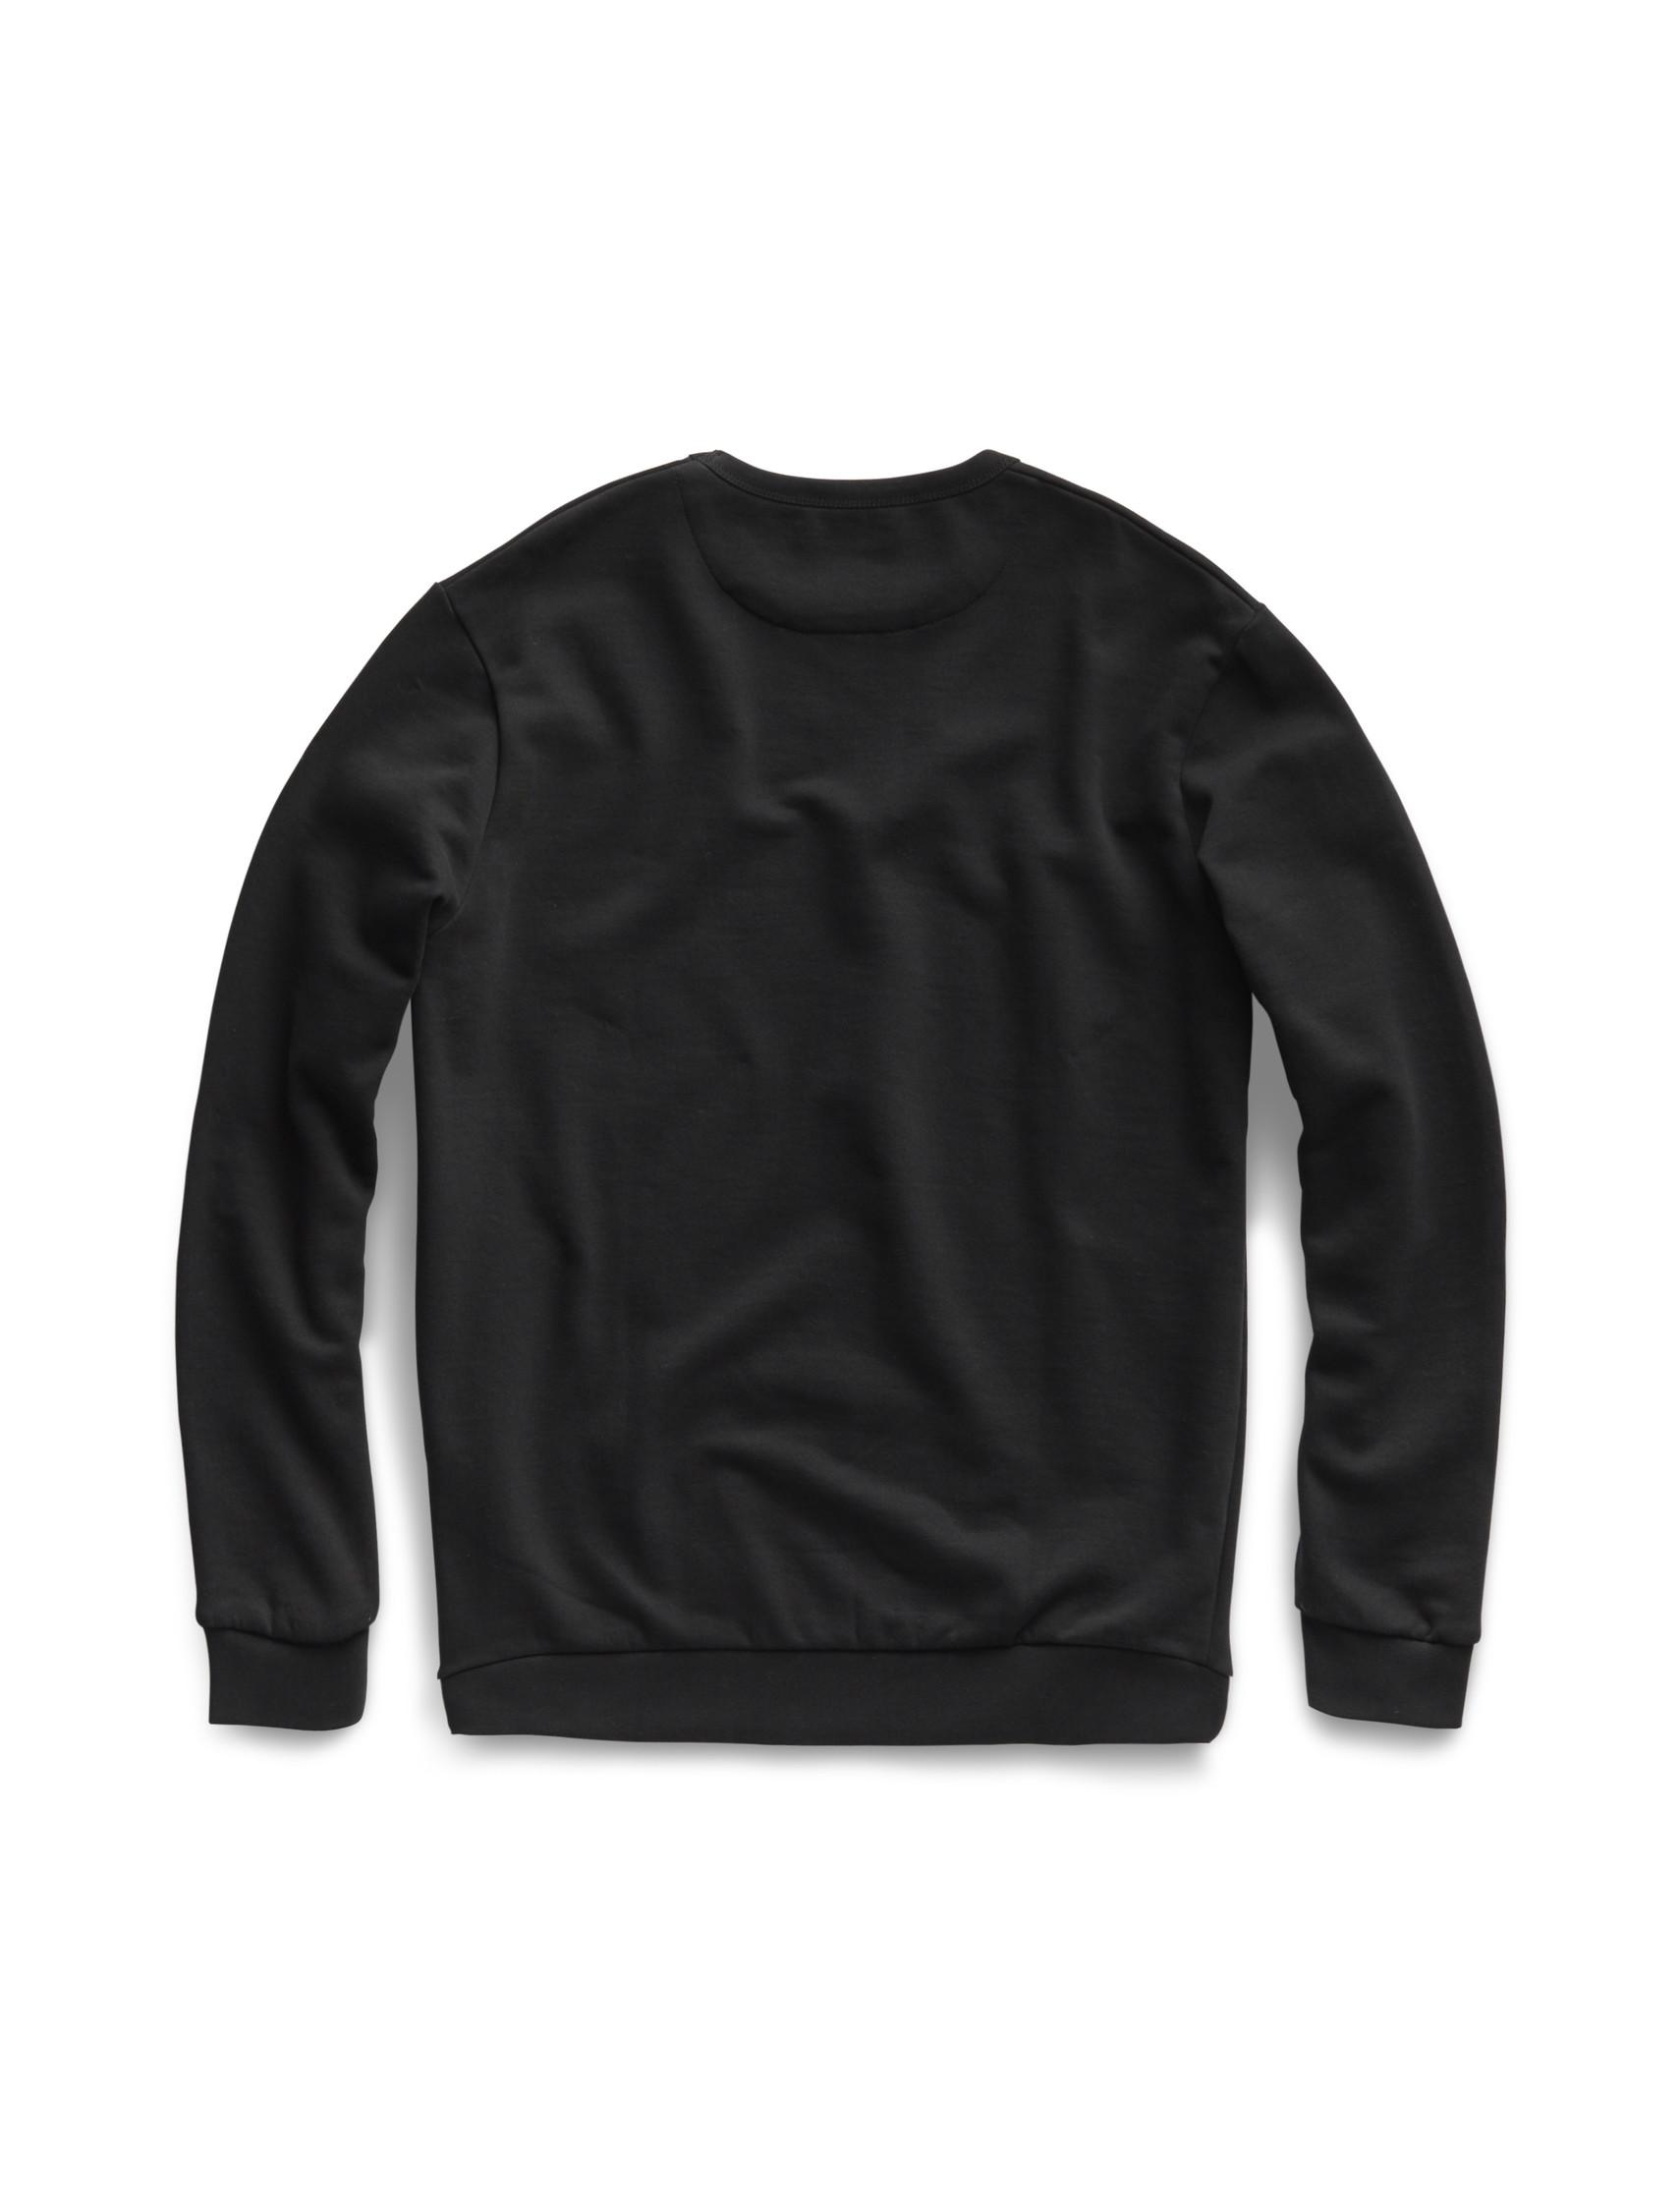 Collective Crewneck - Black (last sizes)